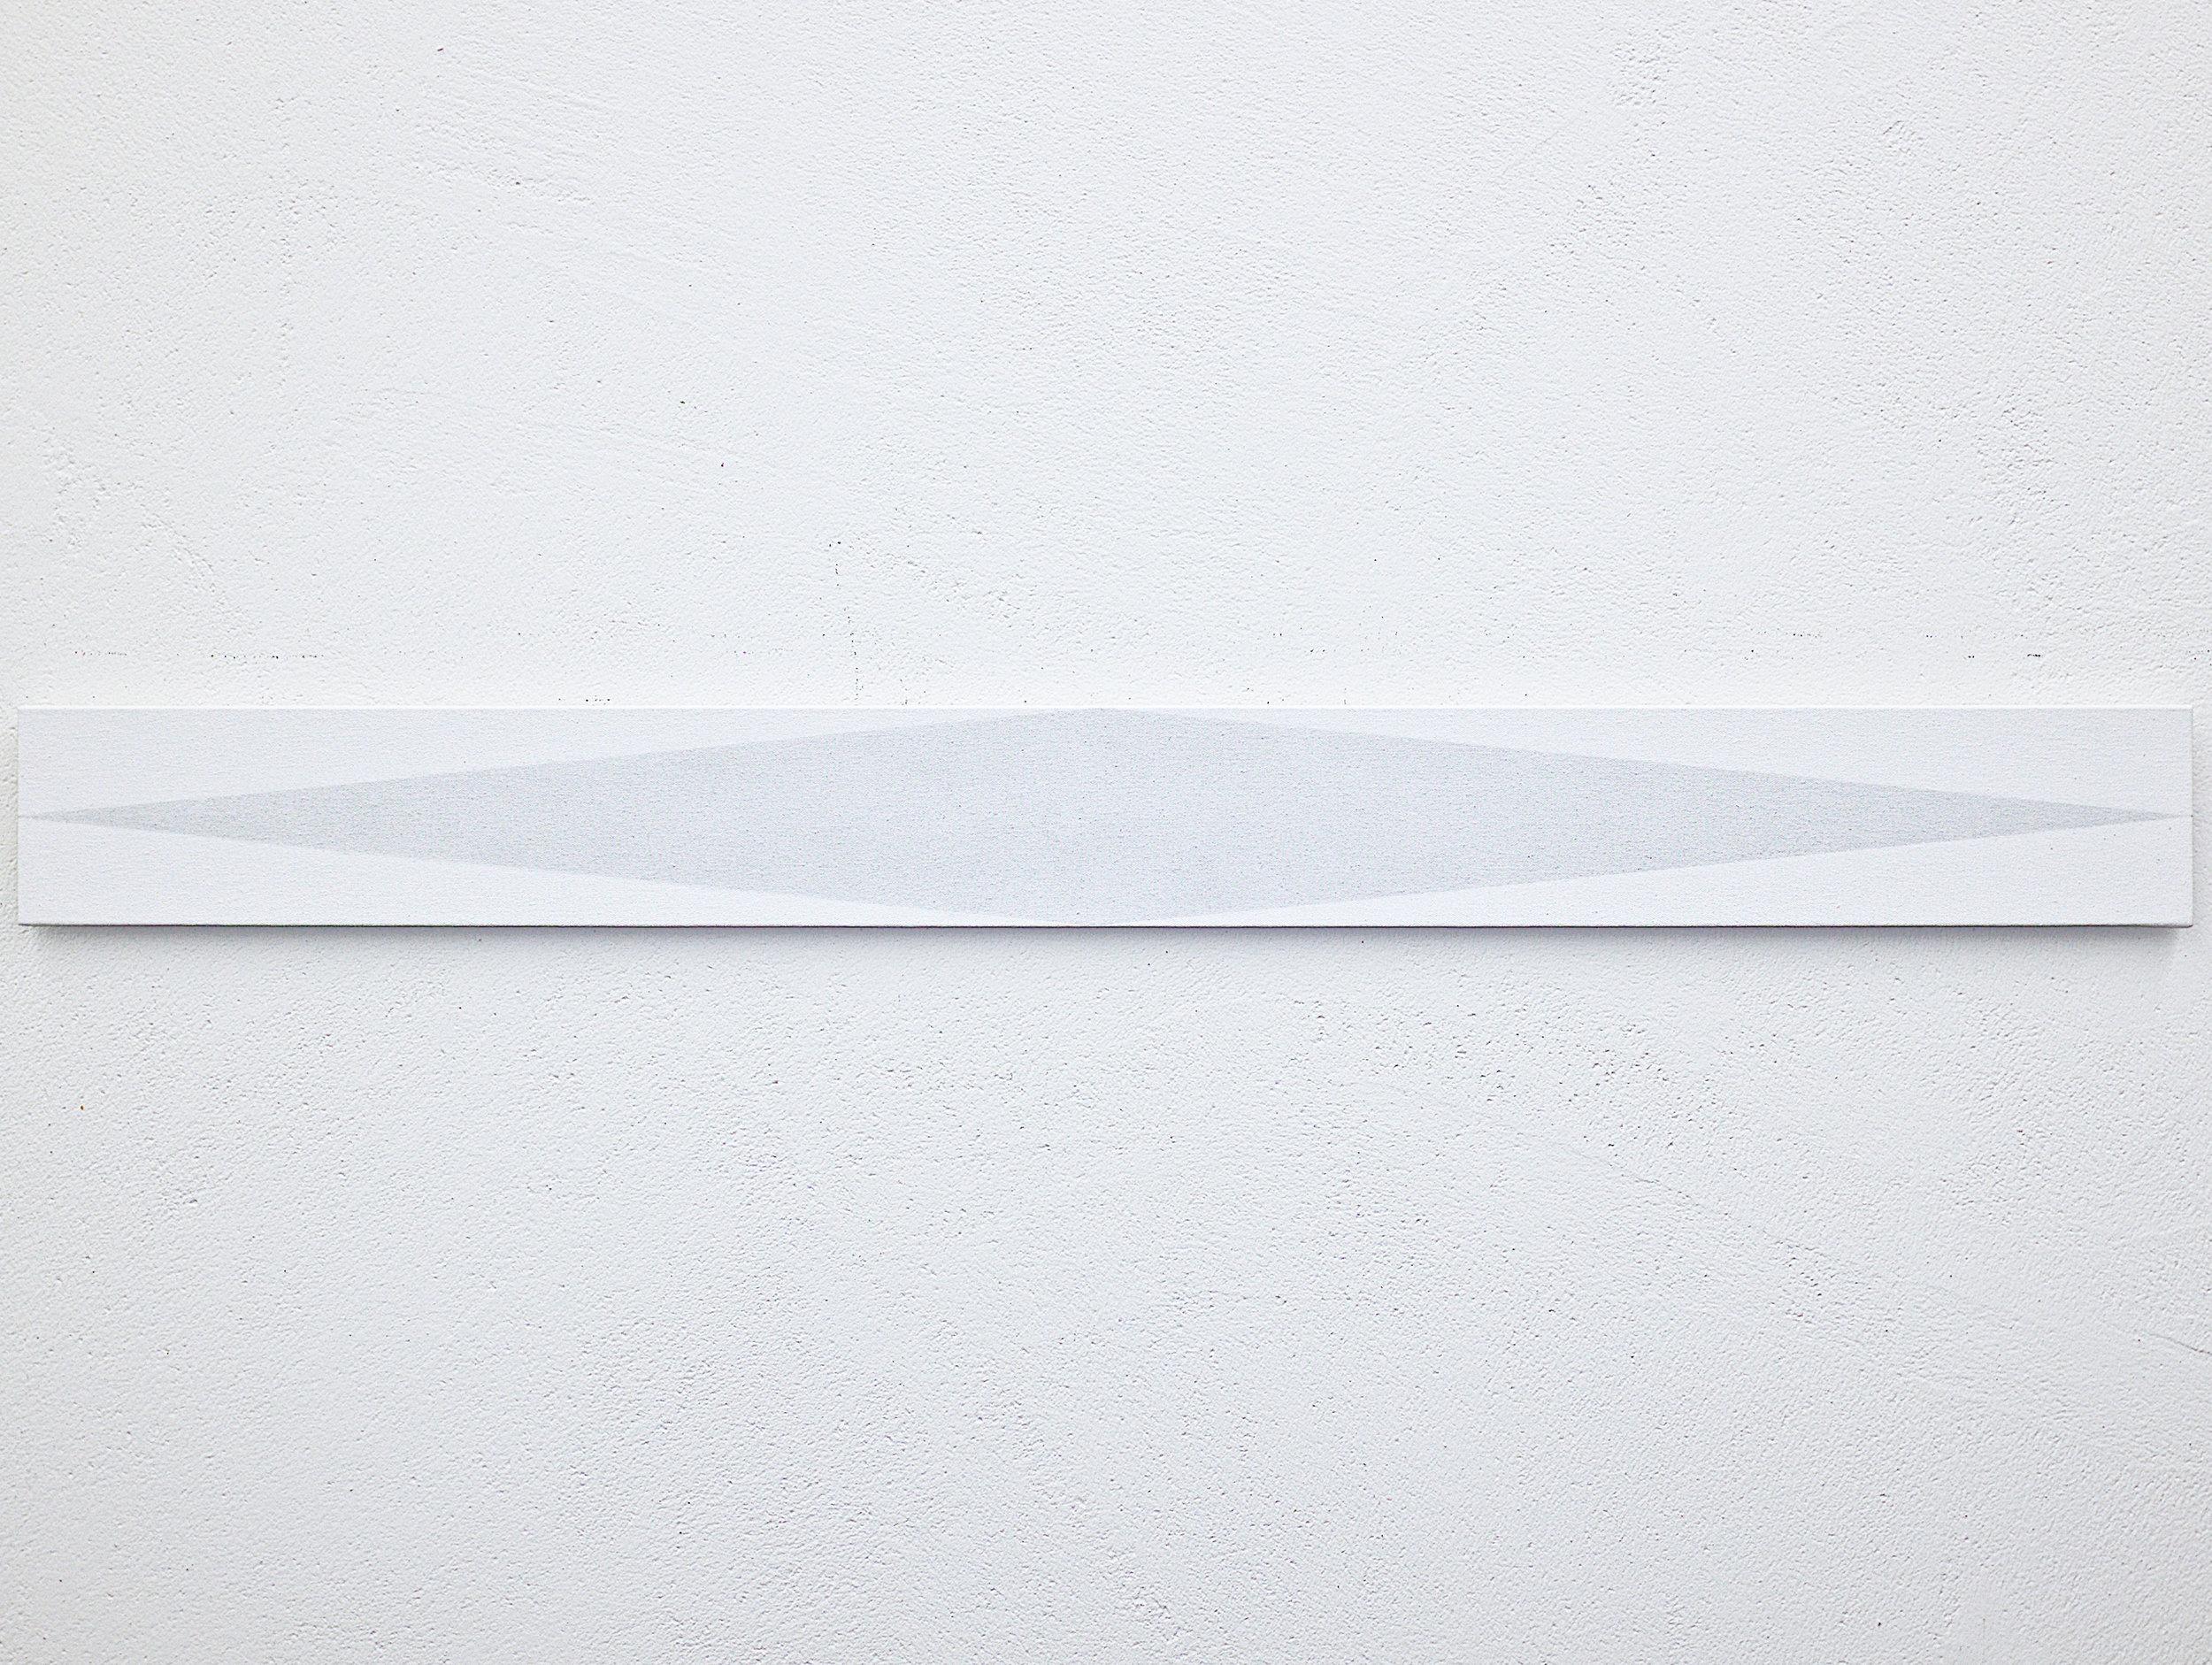 bild nr. 01.2/2017 - 10 x 100cm - acryl auf baumwolle/alu